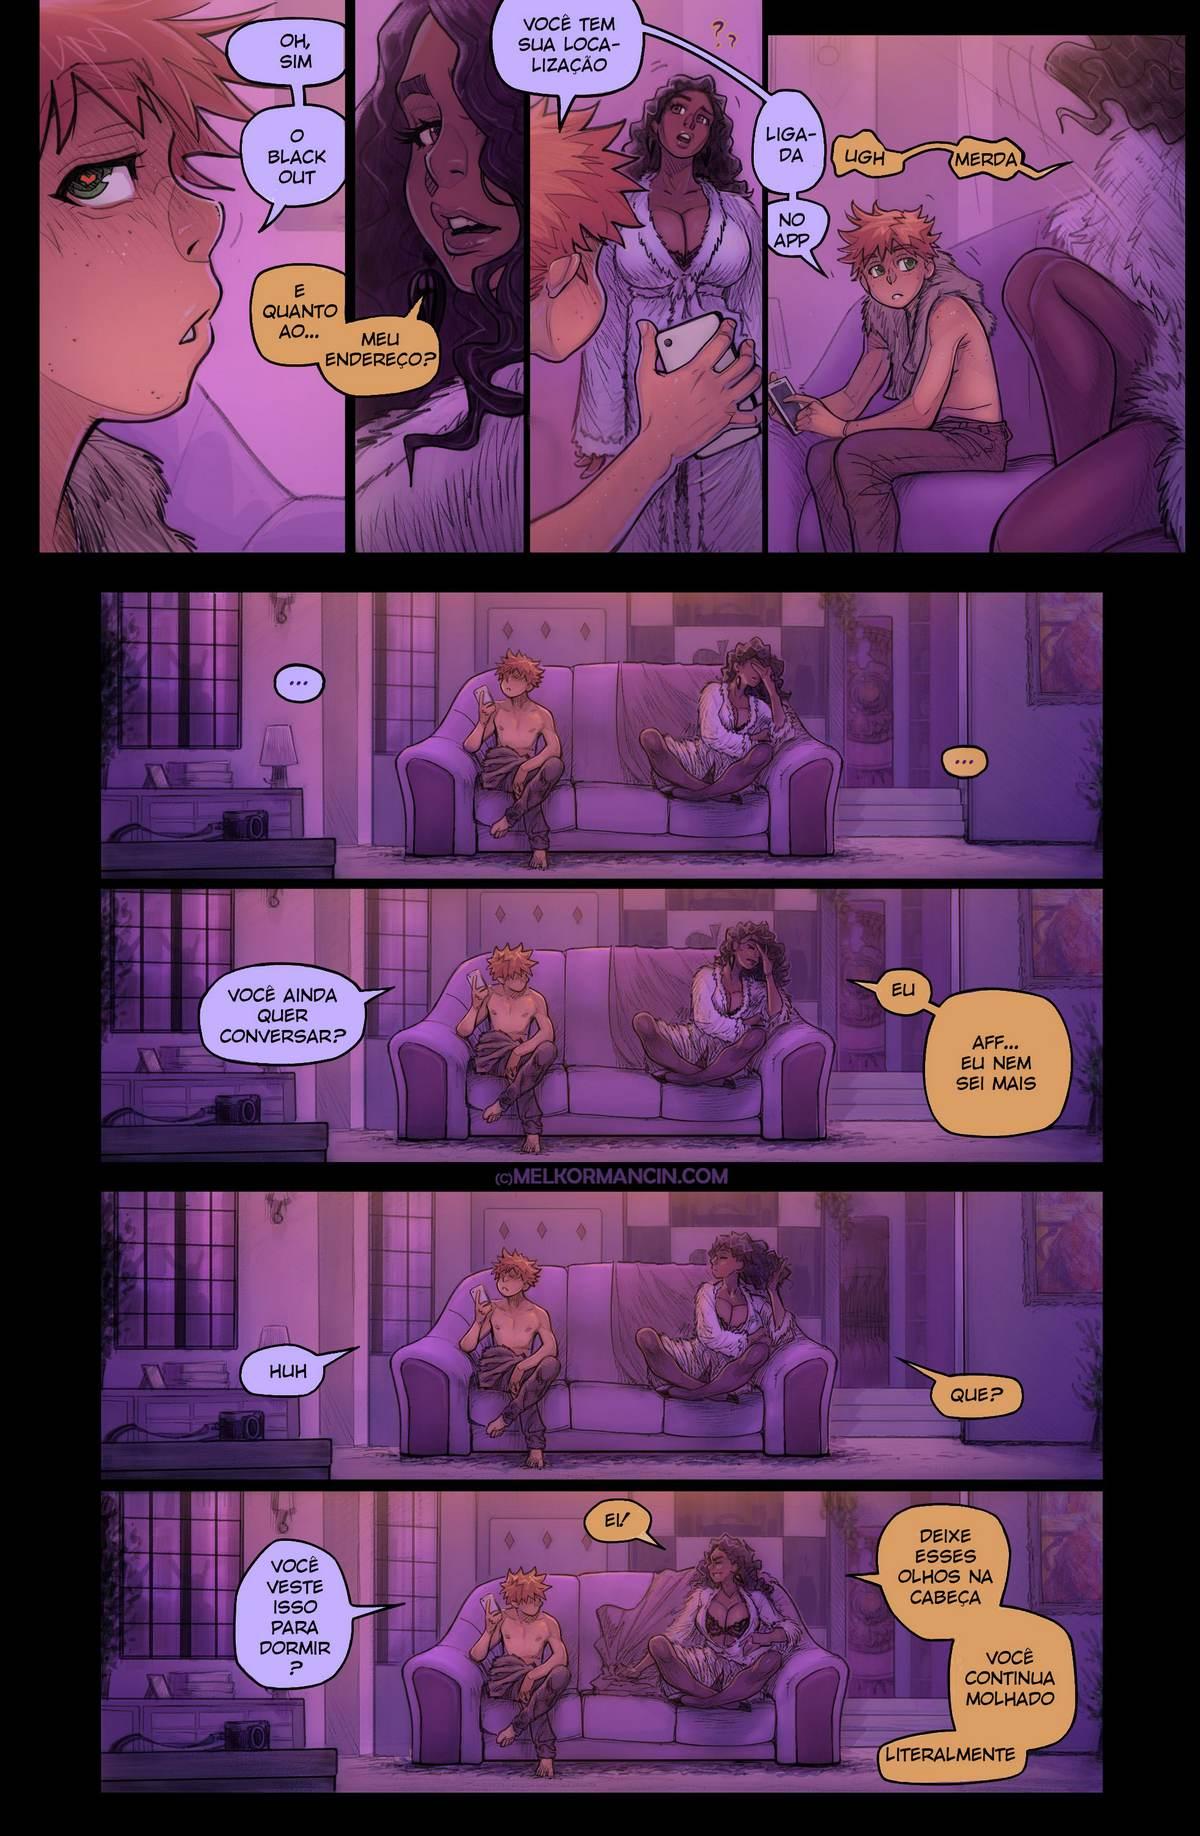 Spades Melkor Mancin Hentai pt br 06 - hentai, exclusiva, comics-hq